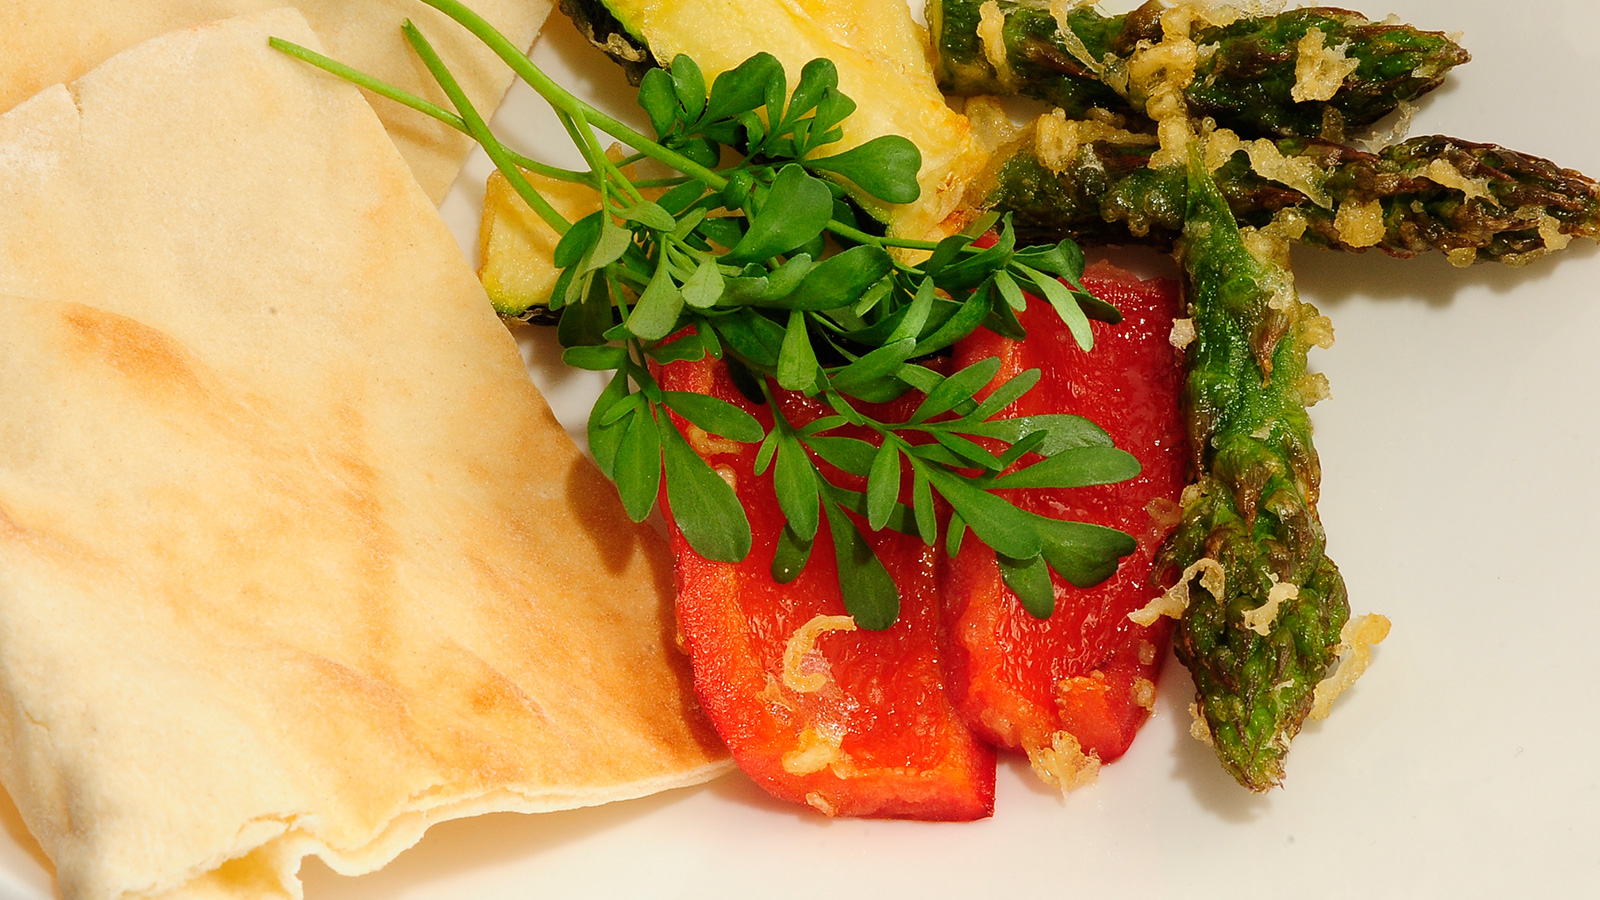 tempura de verduras ana moreno receta canal cocina. Black Bedroom Furniture Sets. Home Design Ideas